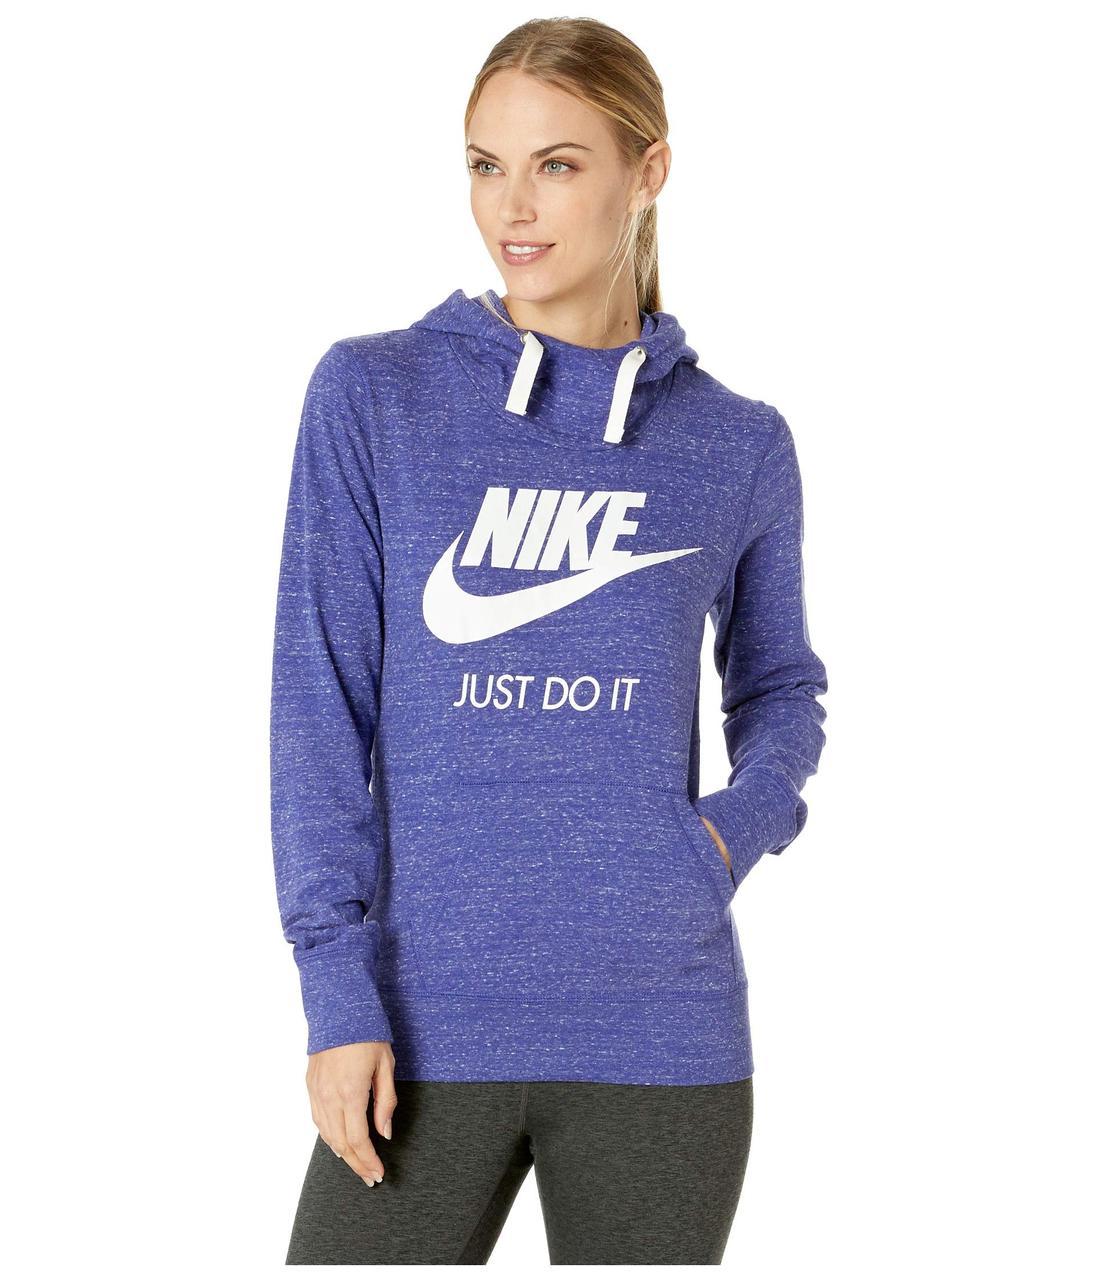 3110dff9293e Толстовка Nike Sportswear Gym Vintage HBR Hoodie Purple - Оригинал - Bigl.ua